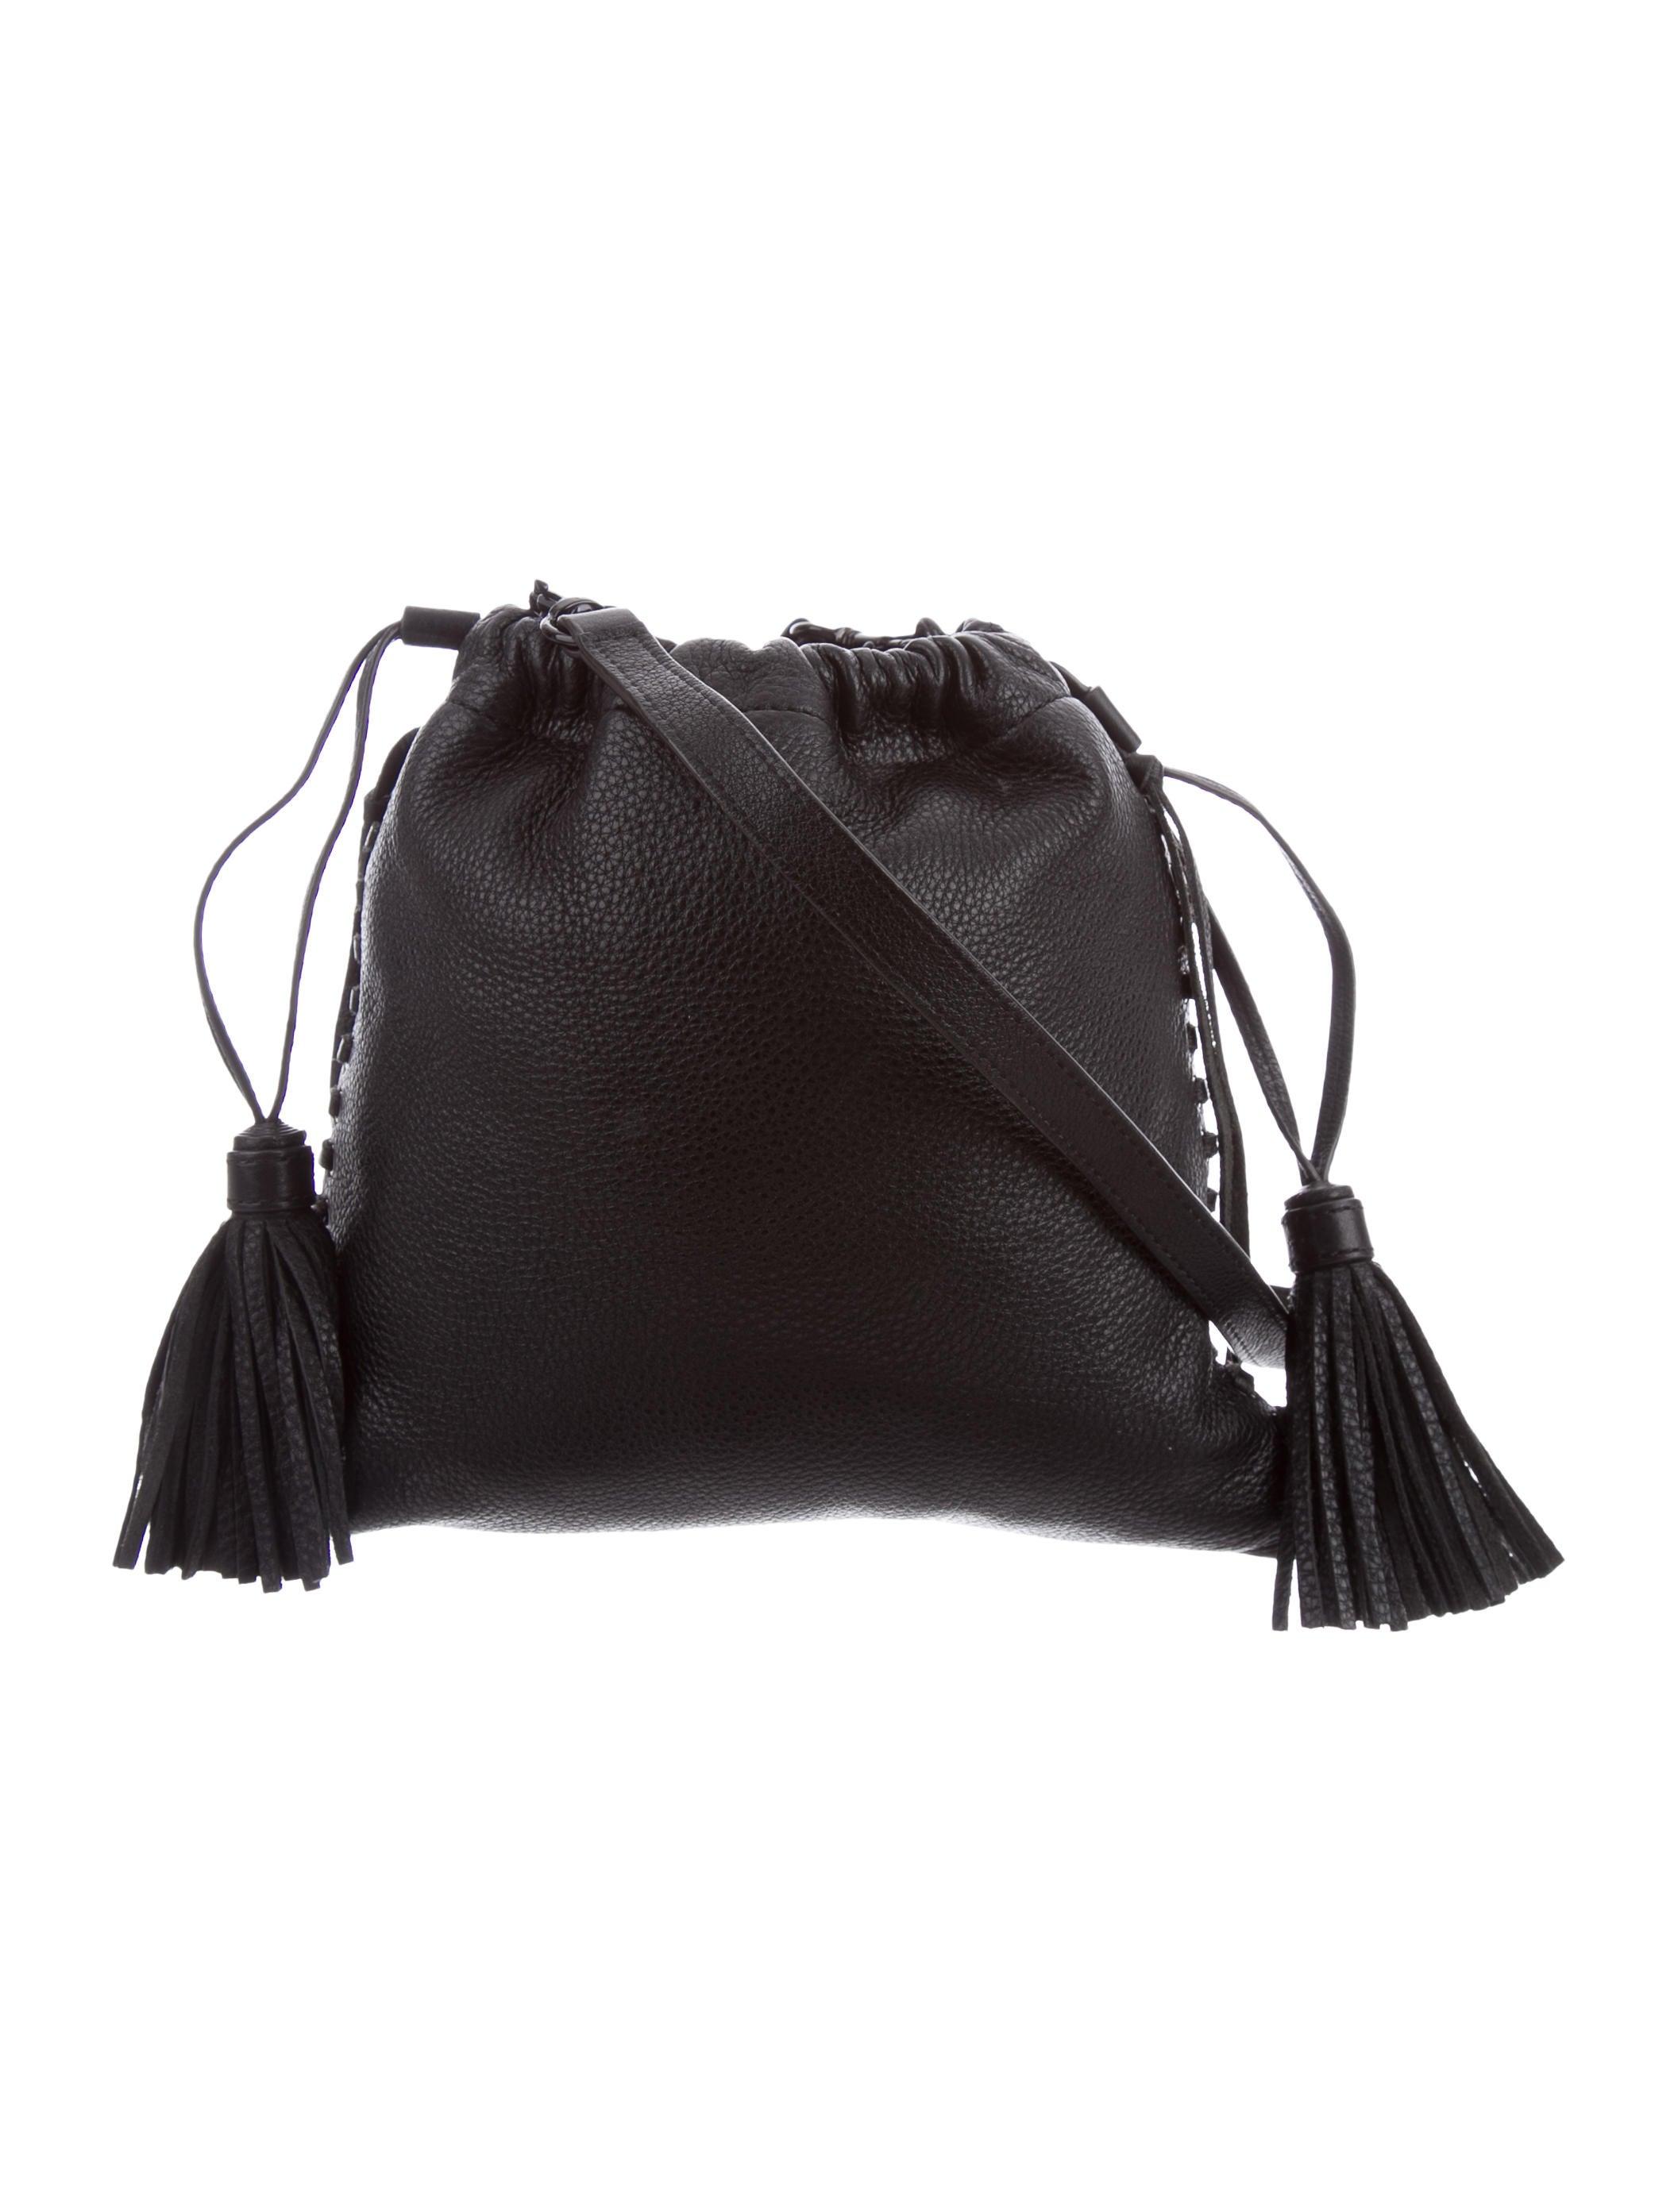 Black Pebbled Leather Crossbody Bag 114